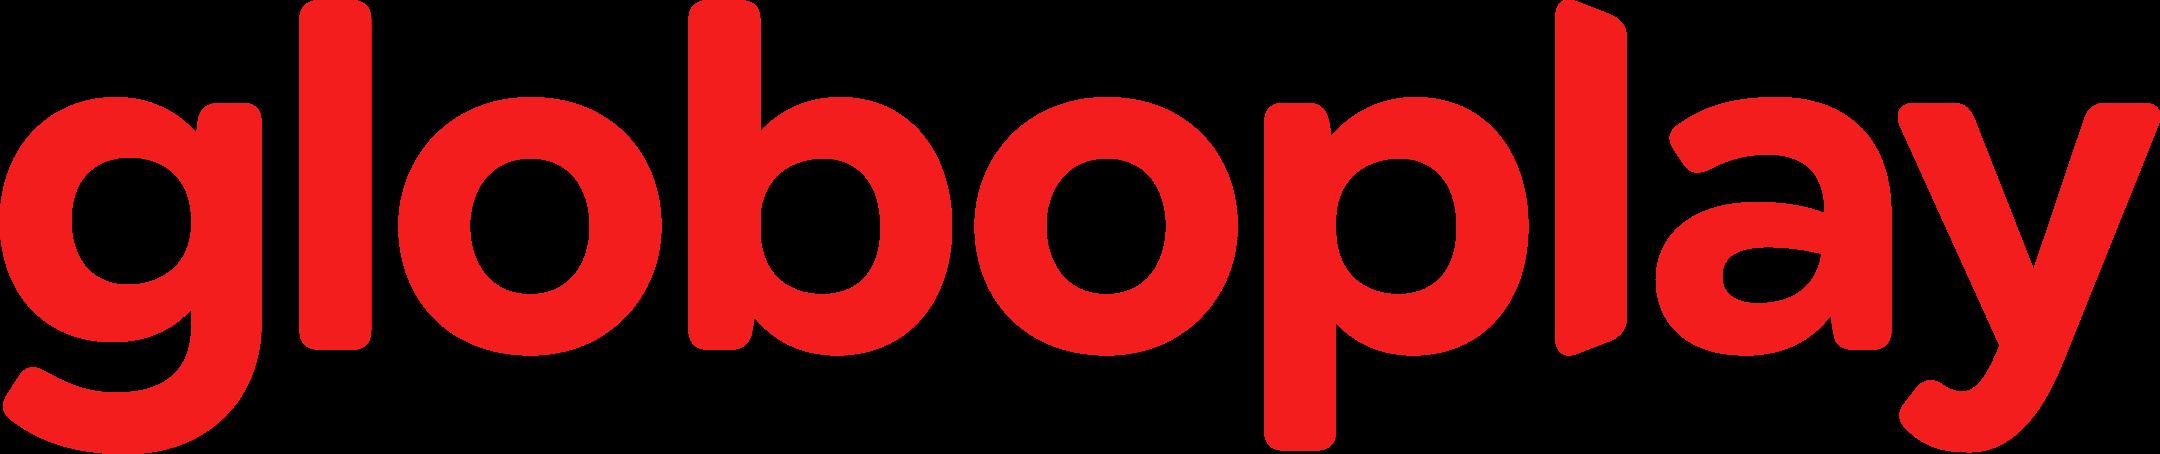 globoplay logo 1 - Globoplay Logo